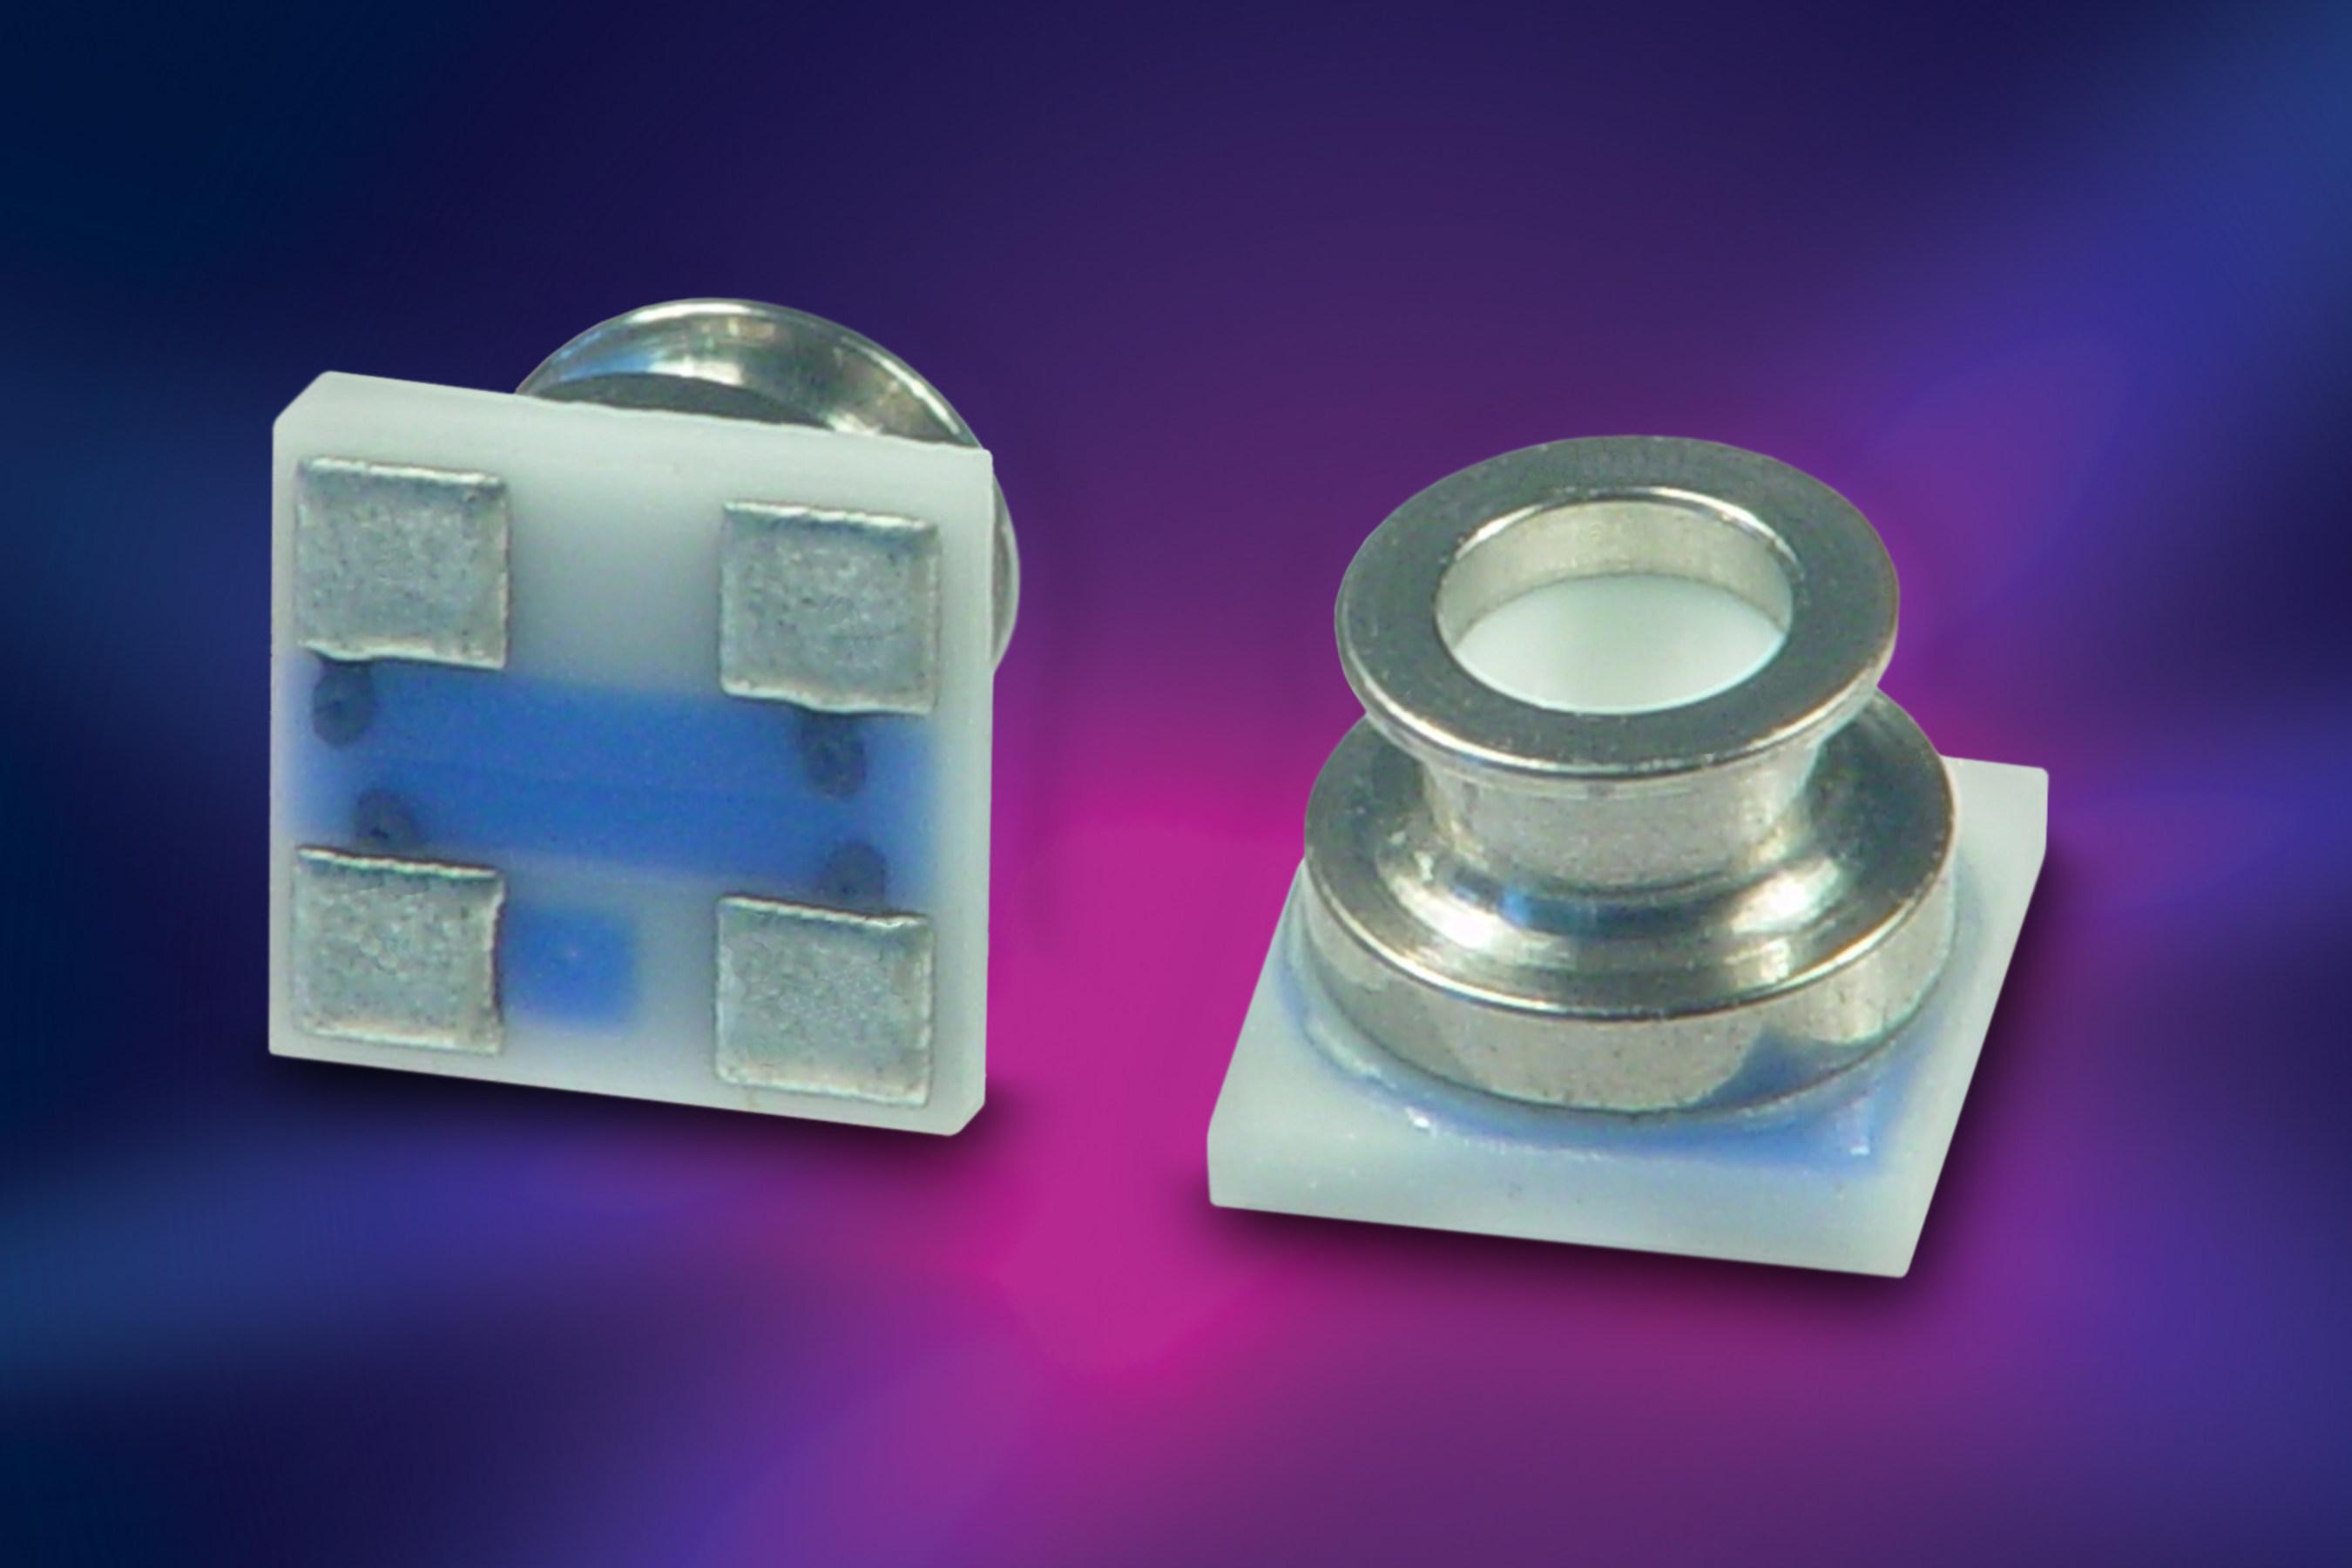 New Versatile Rugged Pressure Sensor Provides High Resolution Temperature Output